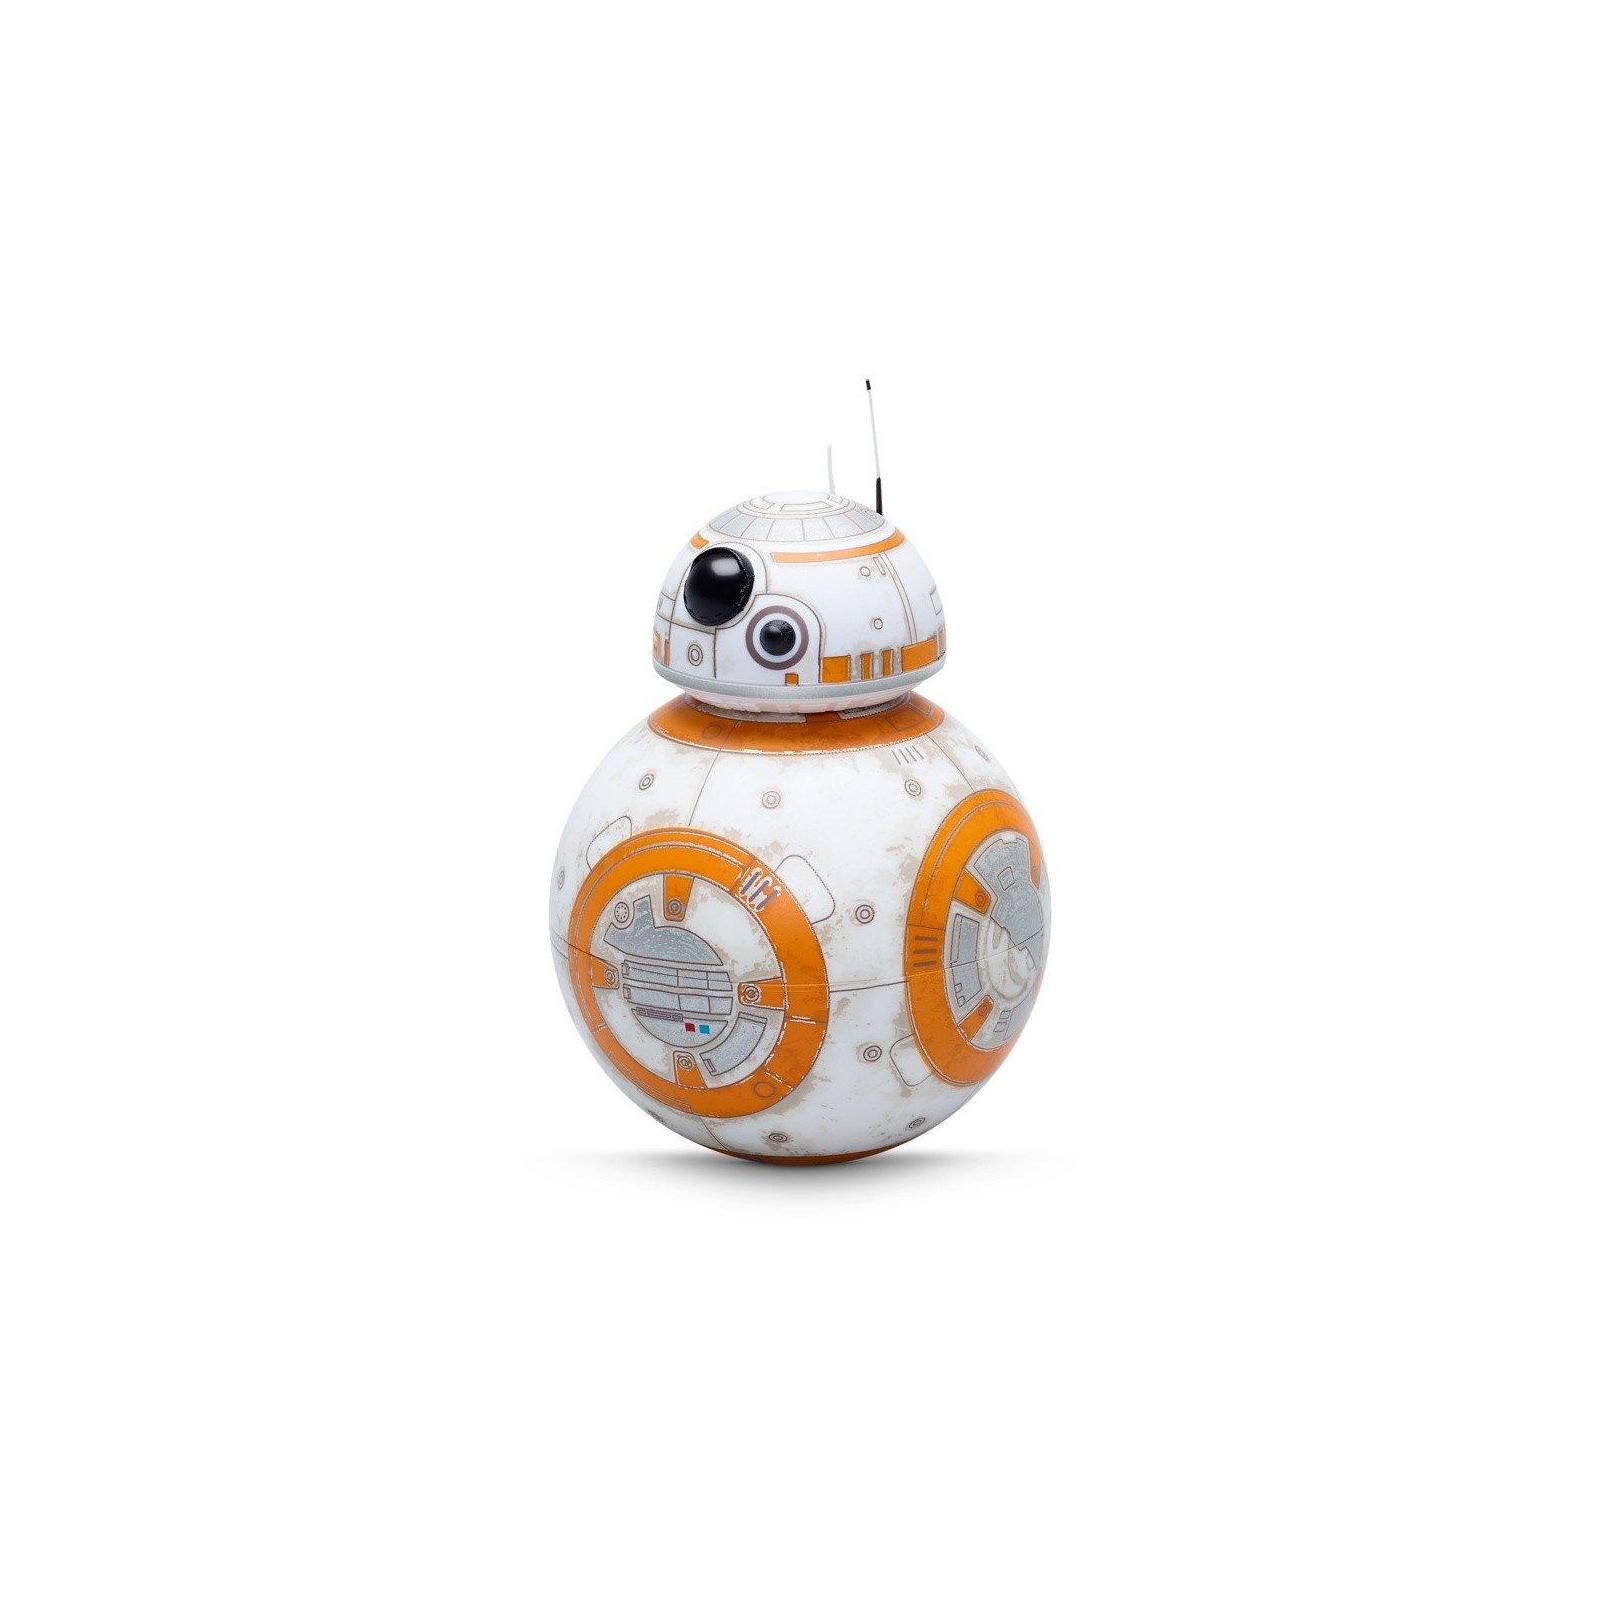 Робот Sphero BB-8 Special Edition with Force Band (322384) изображение 6